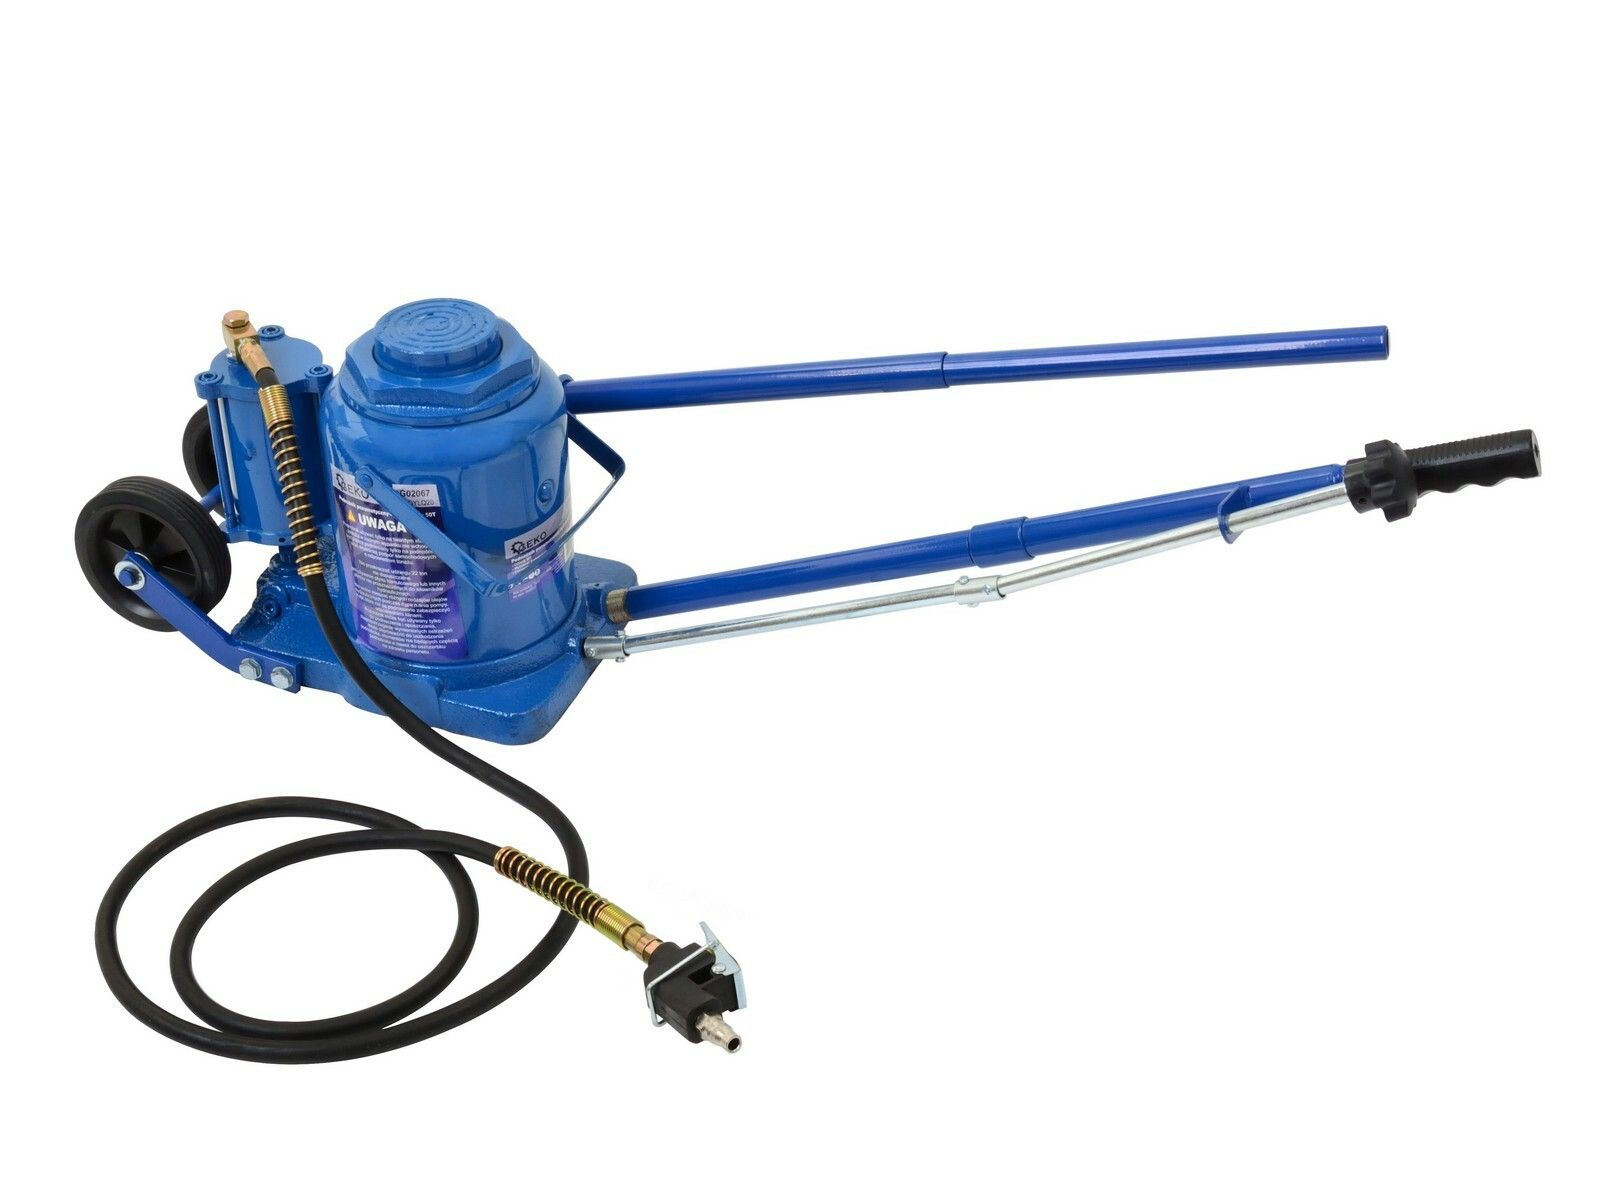 Zvedák hydraulicko-pneumatický 50 tun GEKO